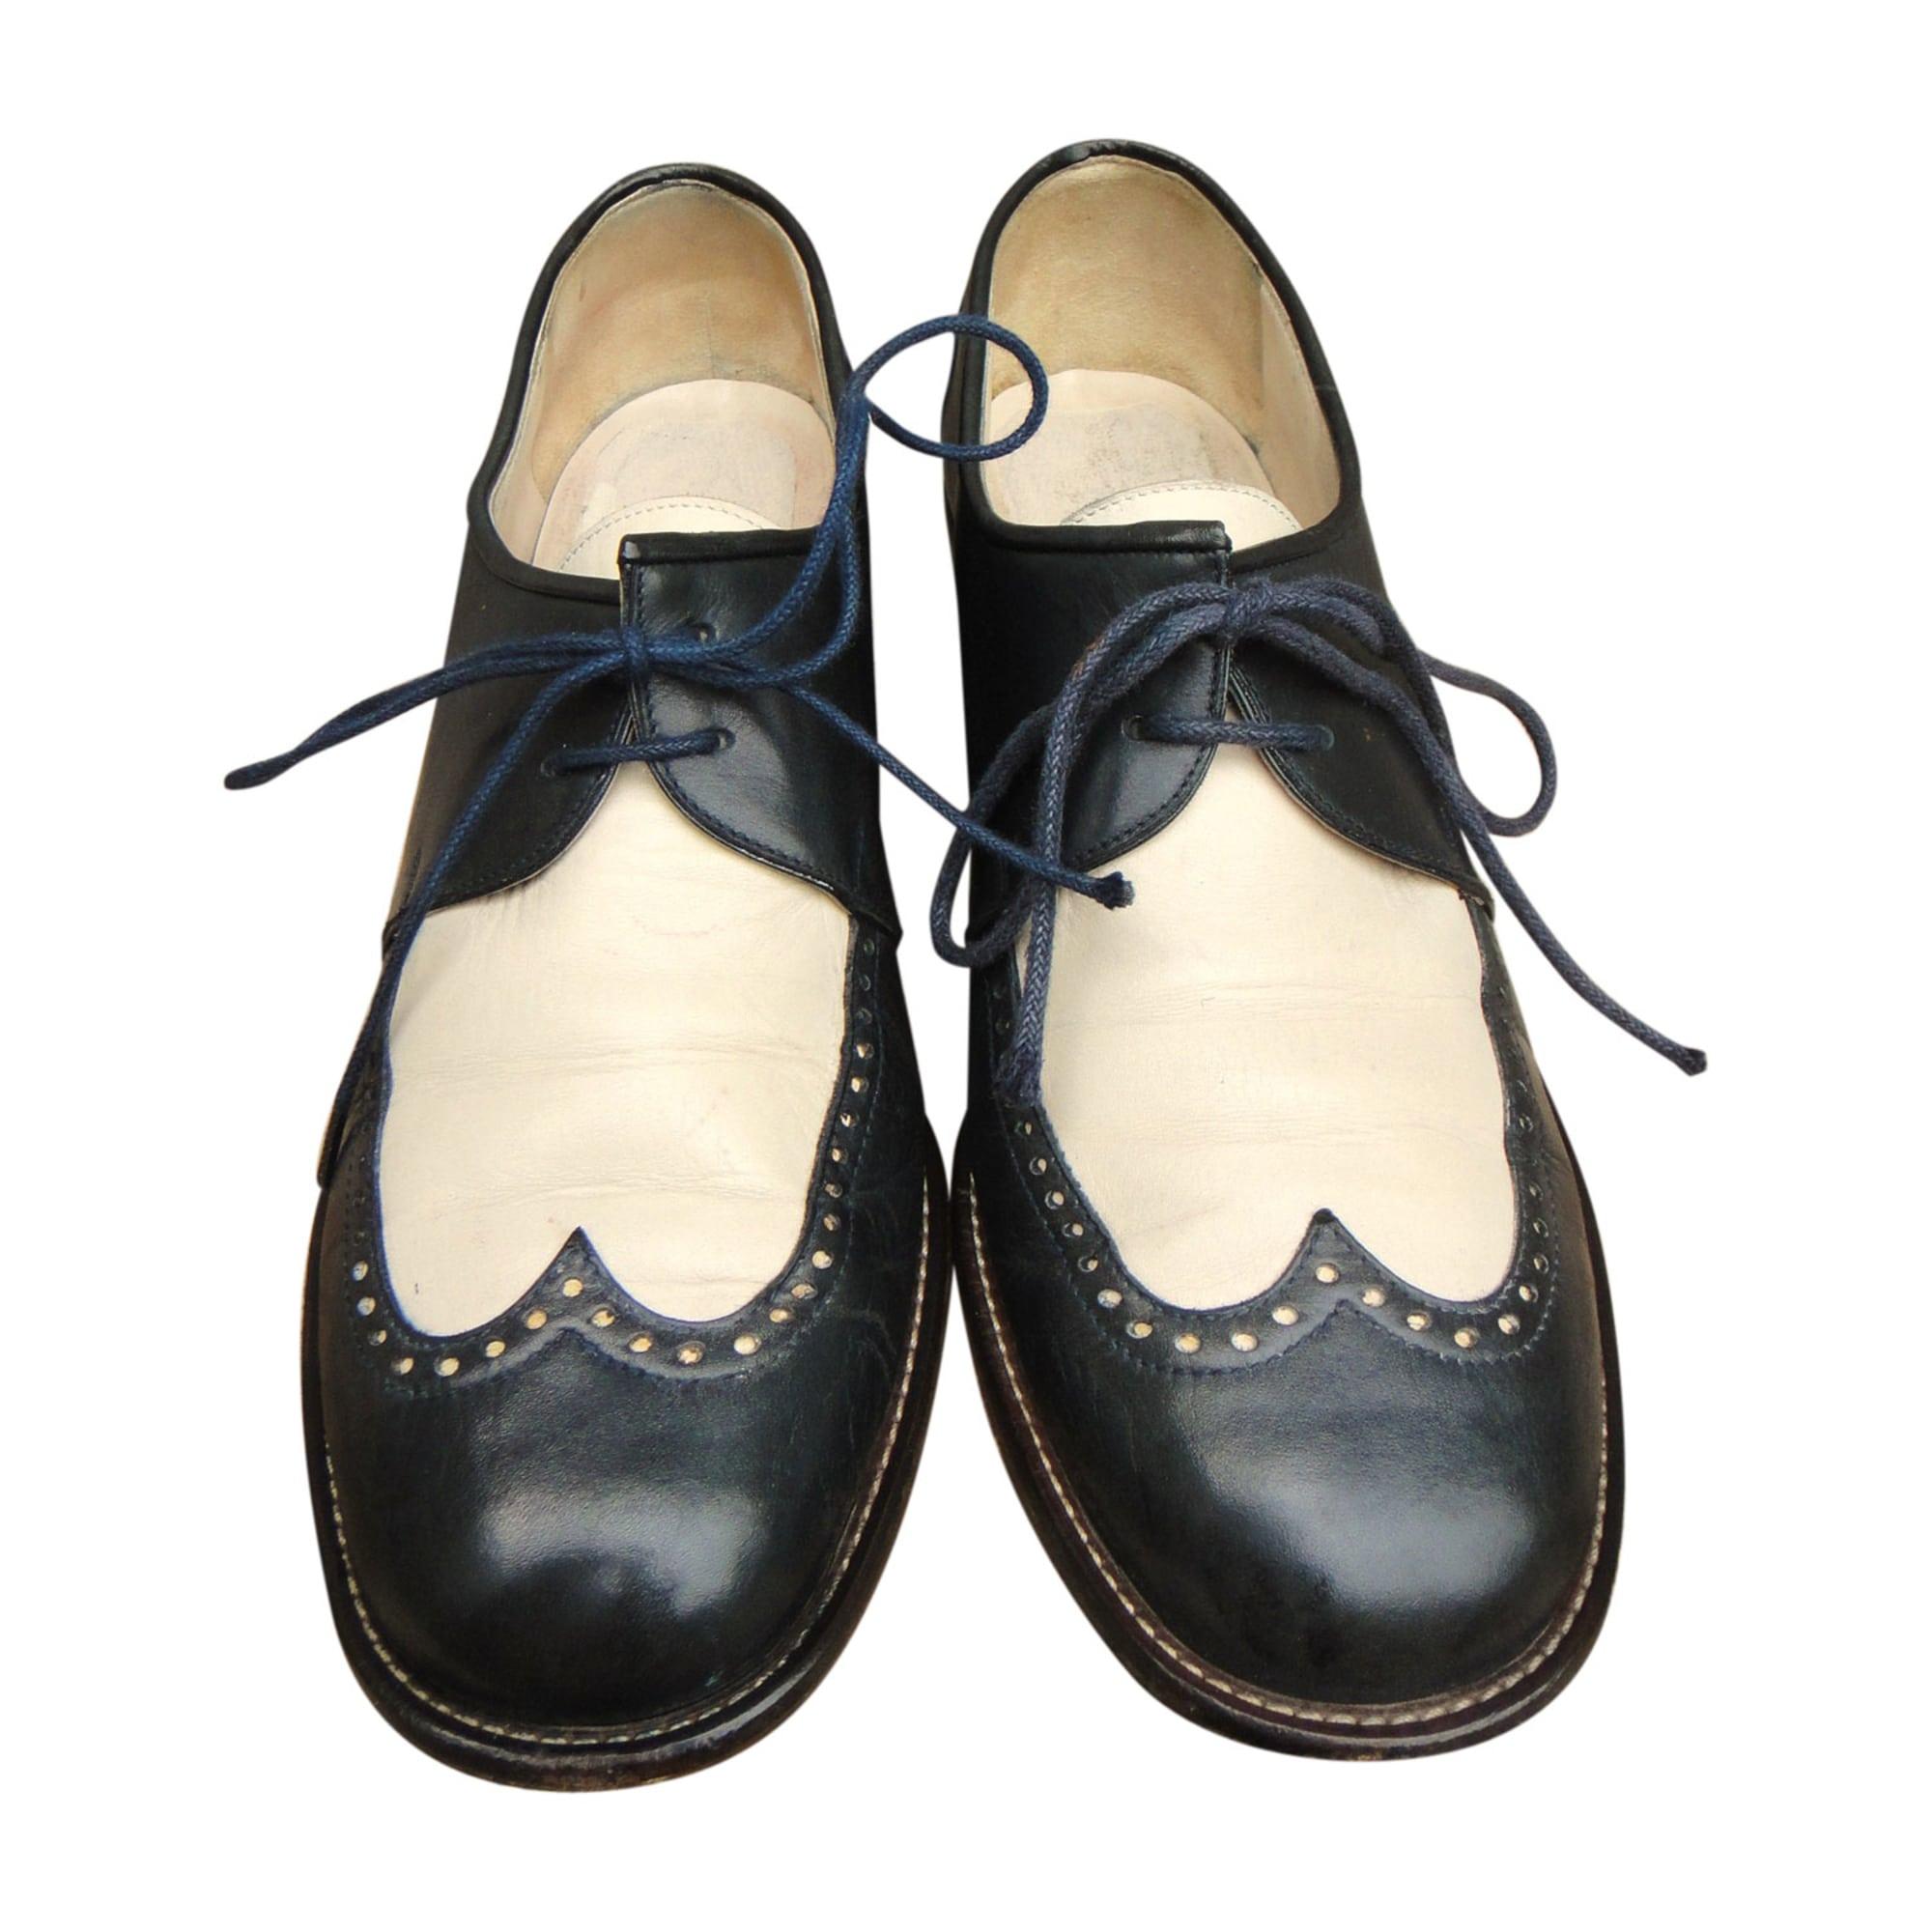 Chaussures à lacets  FRATELLI ROSSETTI bicolore